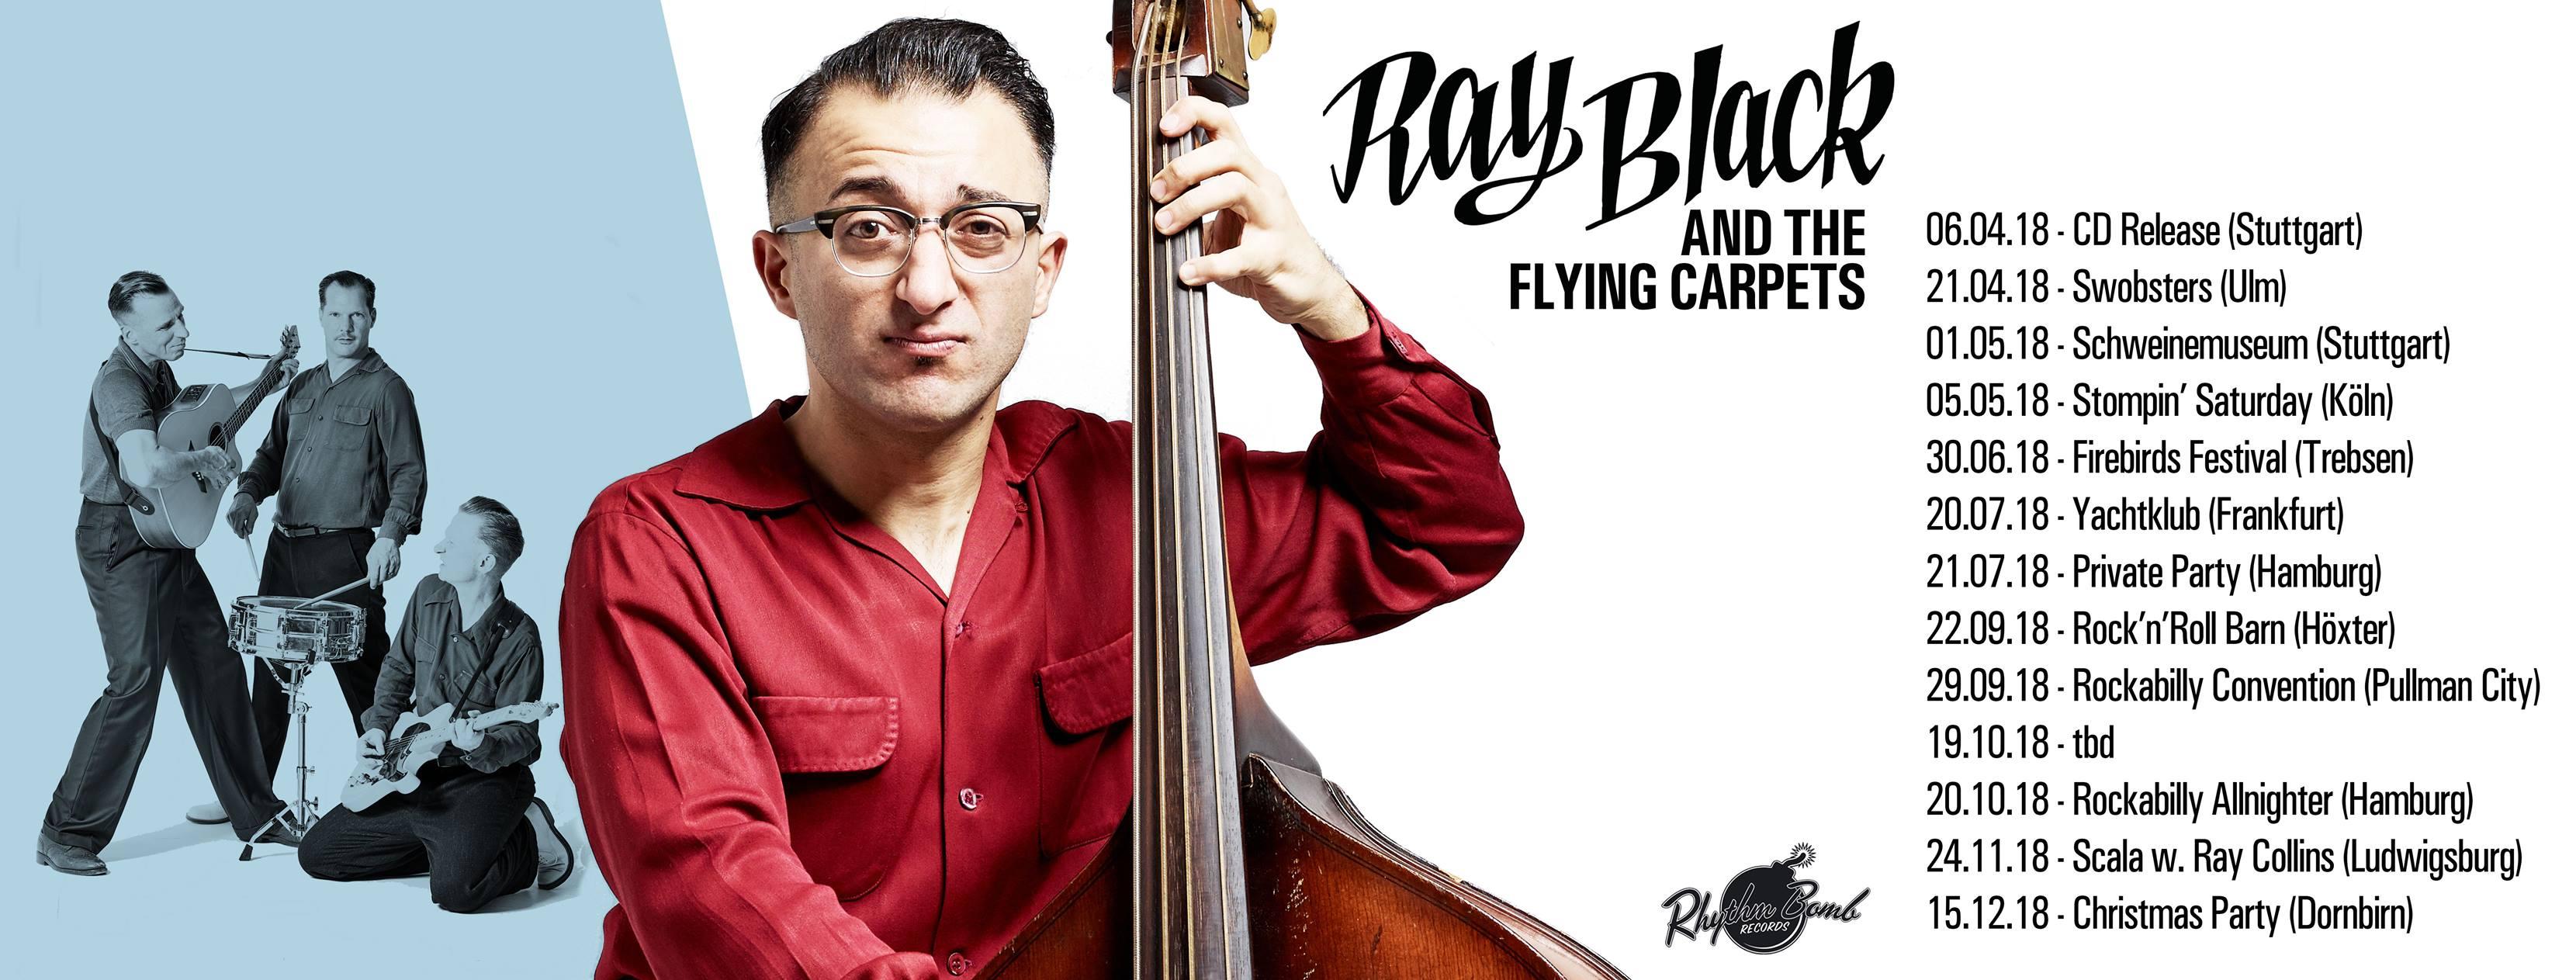 Better Way To Move - Debütalbum des Rockabilly-Quartetts RAY BLACK & THE FLYING CARPETS aus Calw bei Stuttgart // full Album stream + Tourdaten